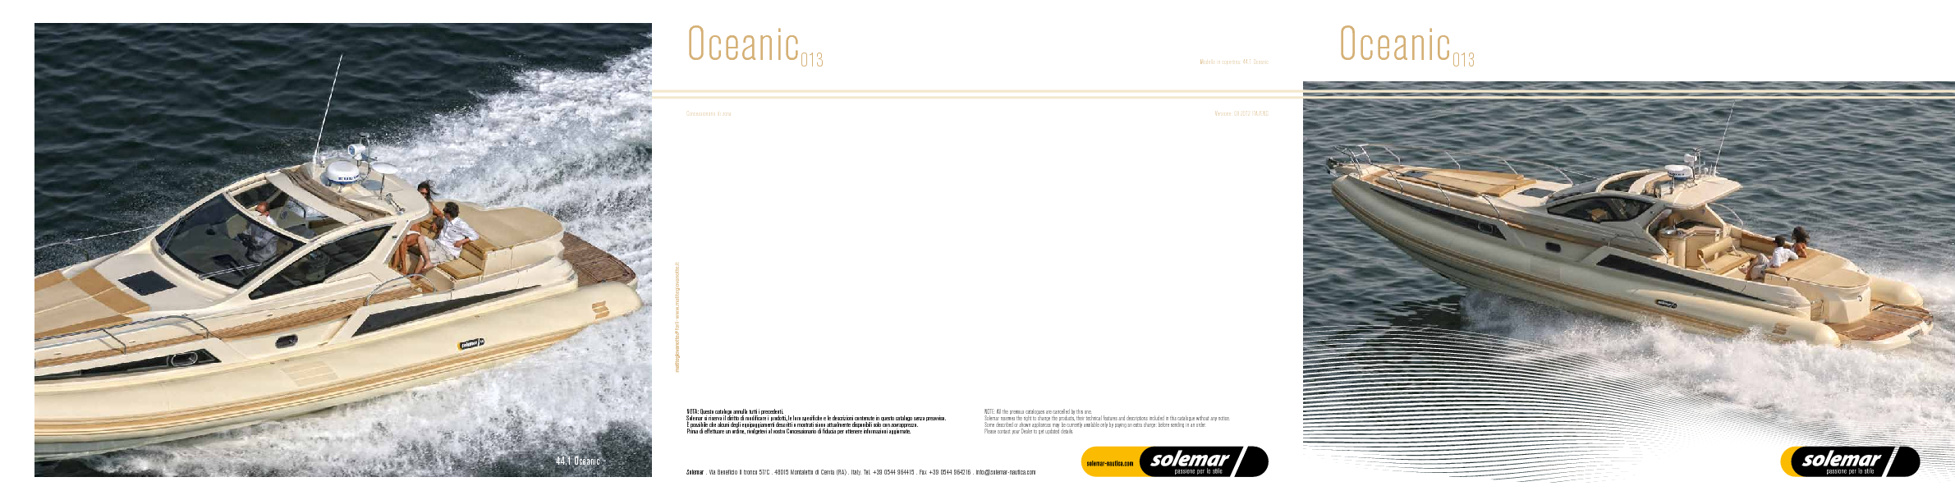 "2013 Solemar Nautica ""OCEANIC LINE"""